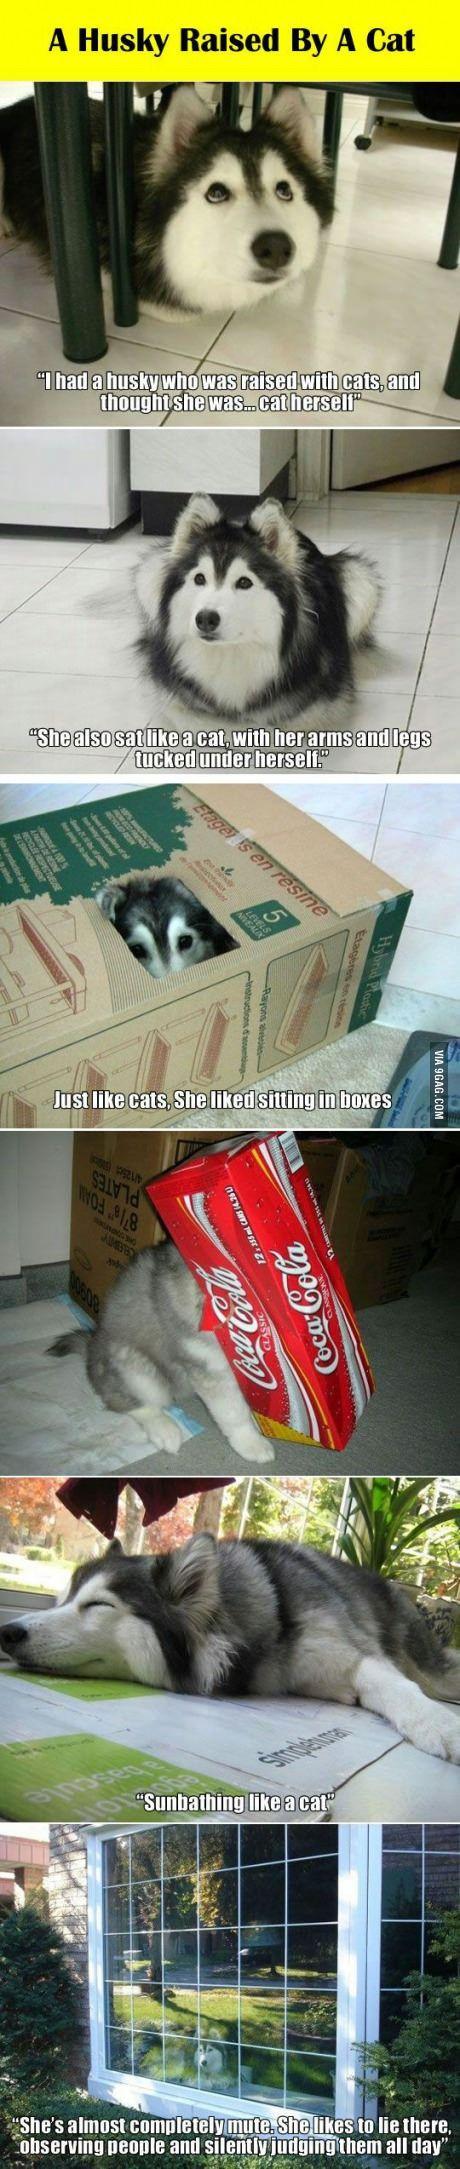 A Husky Raised by a Cat